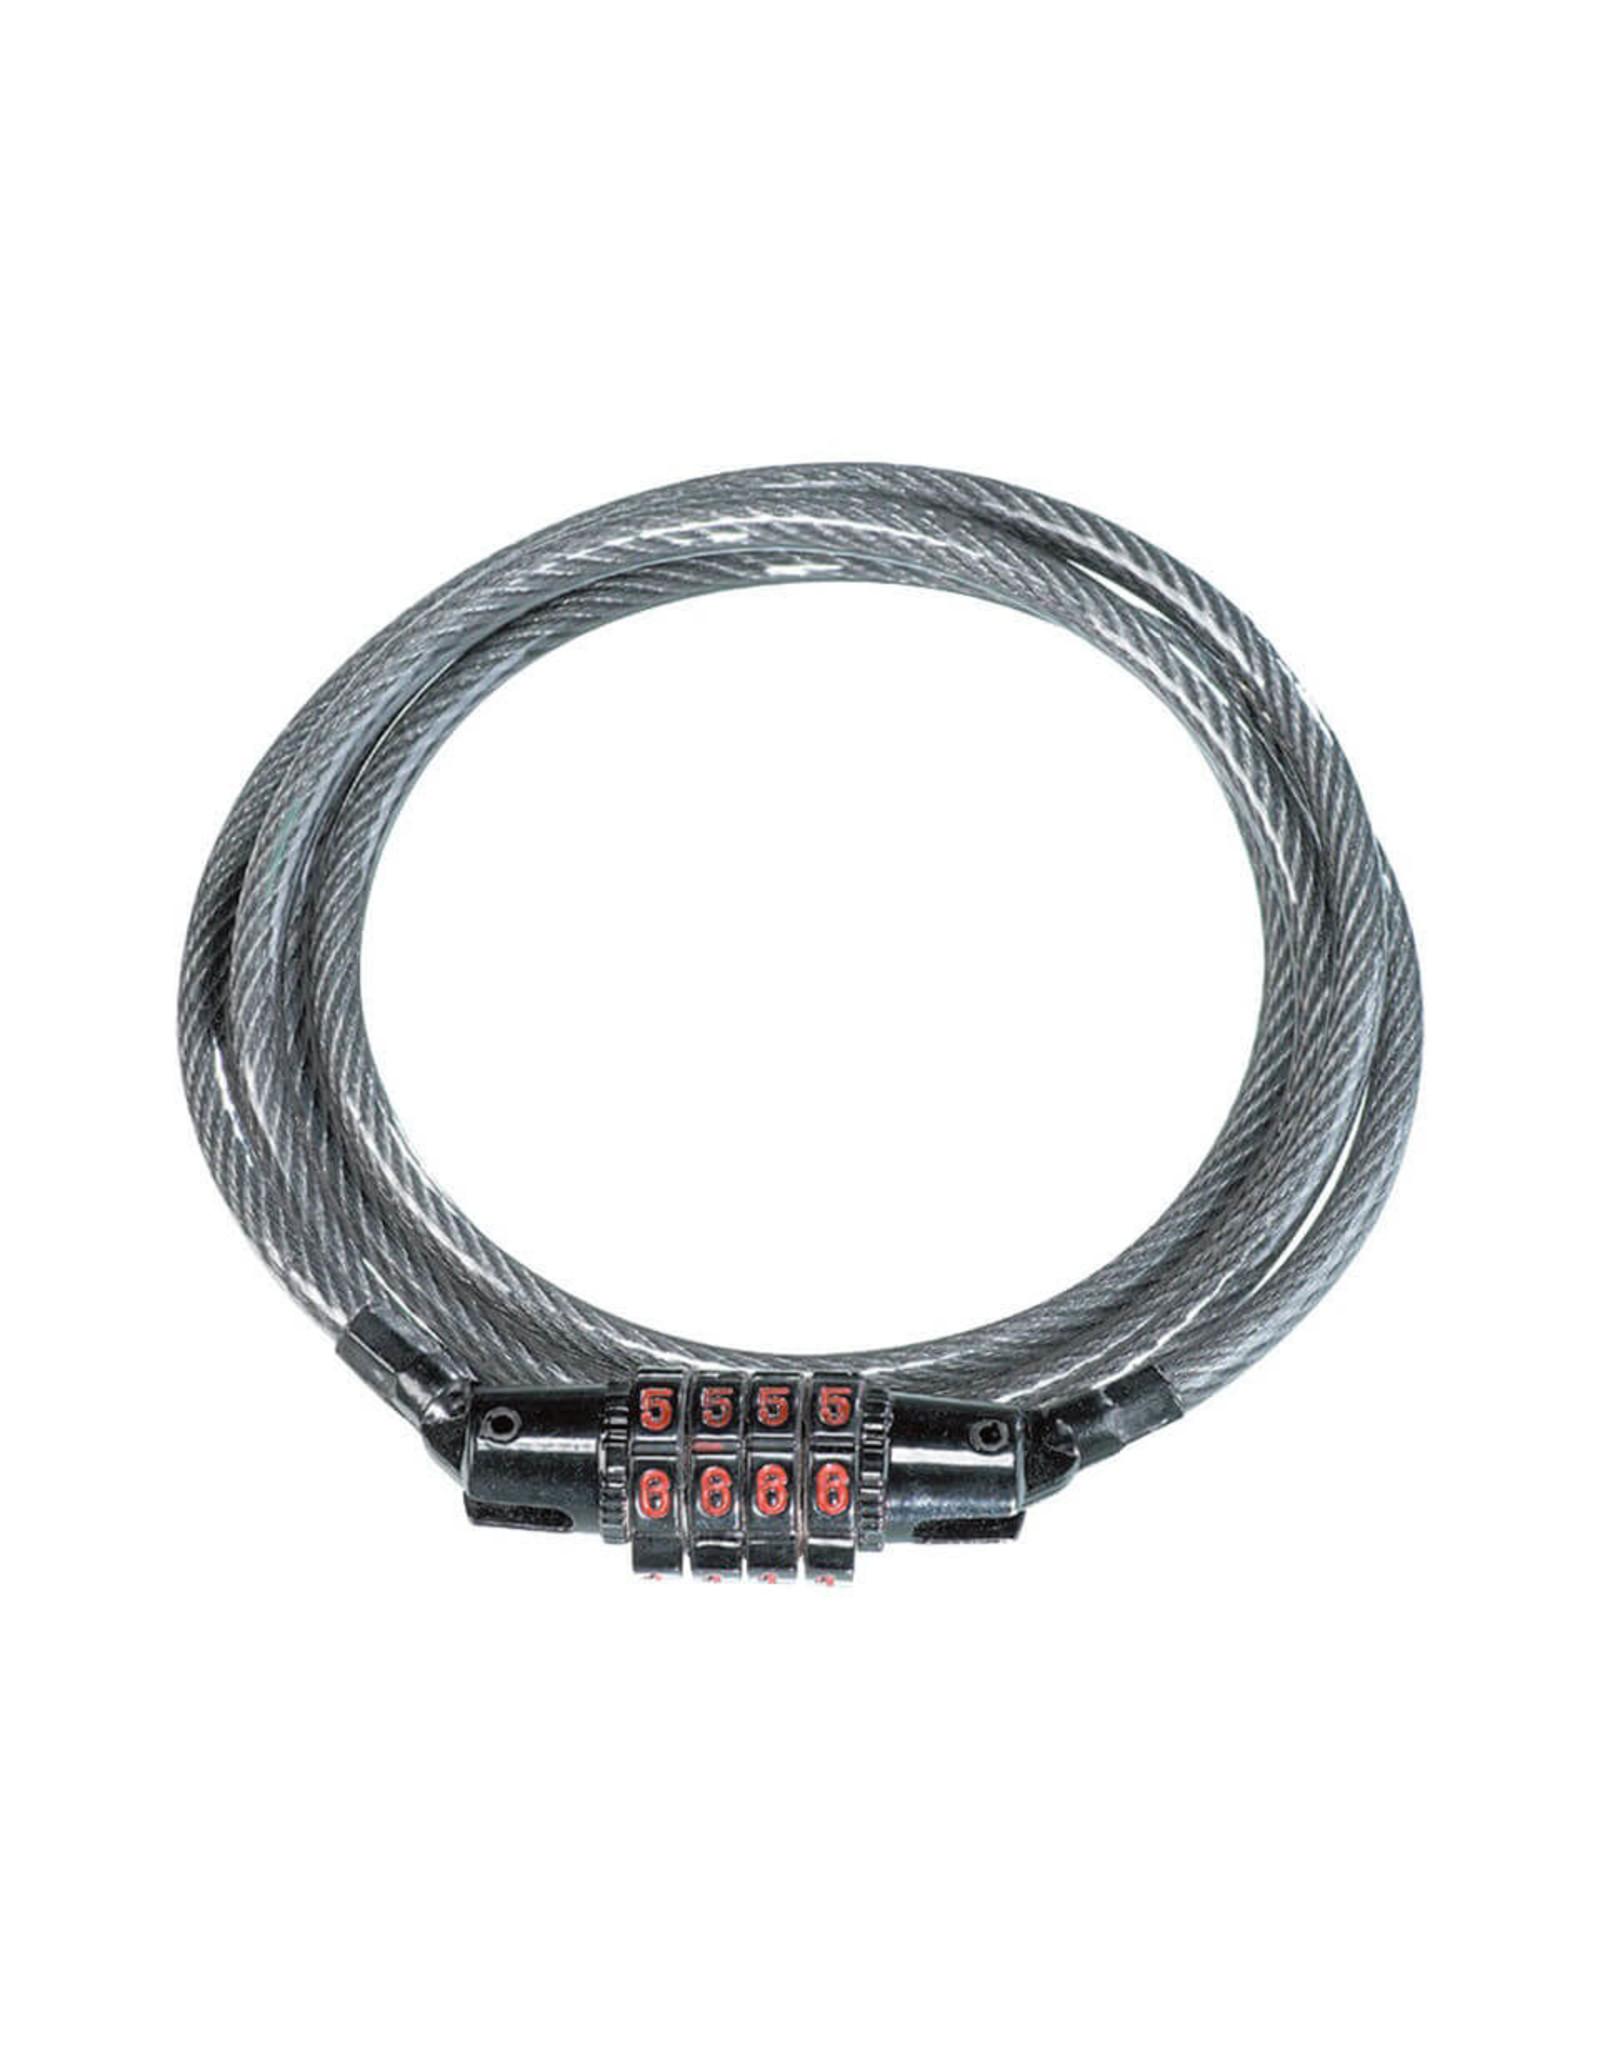 Kryptonite KEEPER 512 COMBO CABLE LOCK